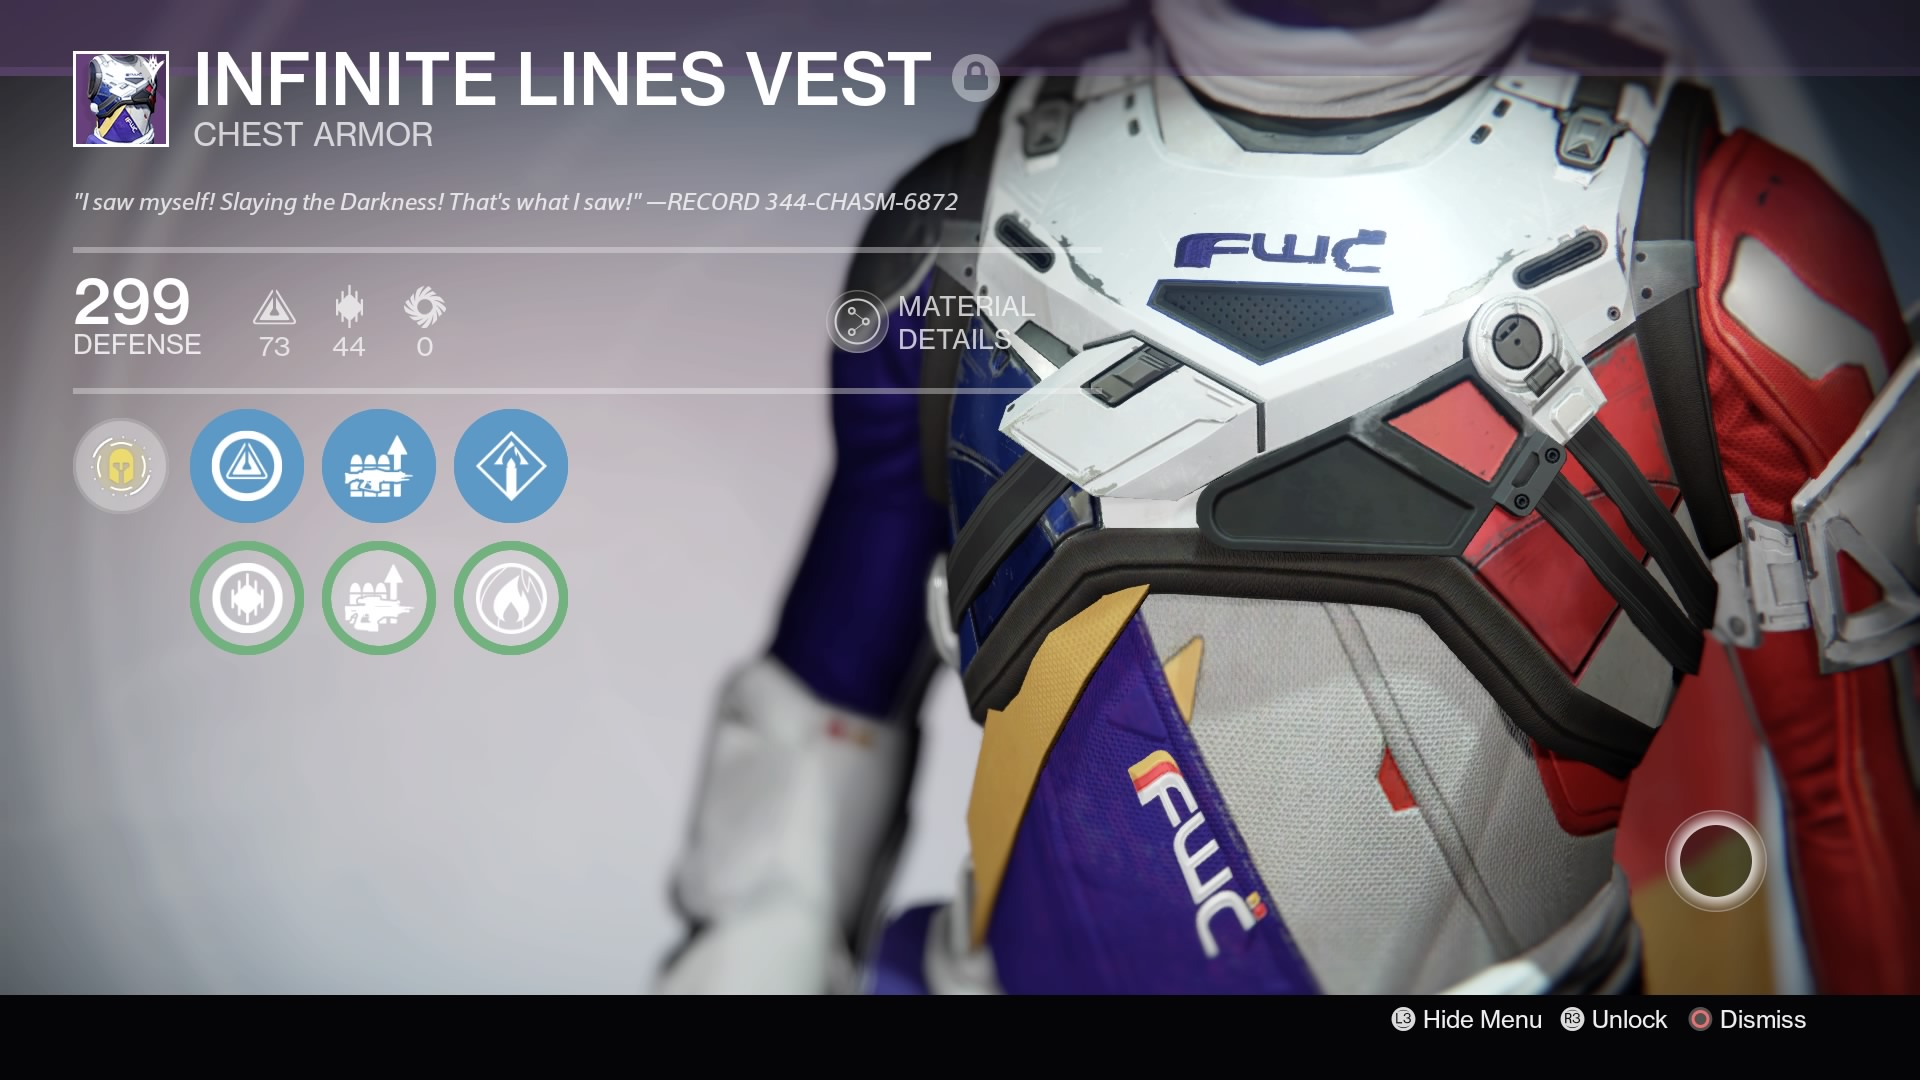 fwc_infinite_lines_vest.jpg